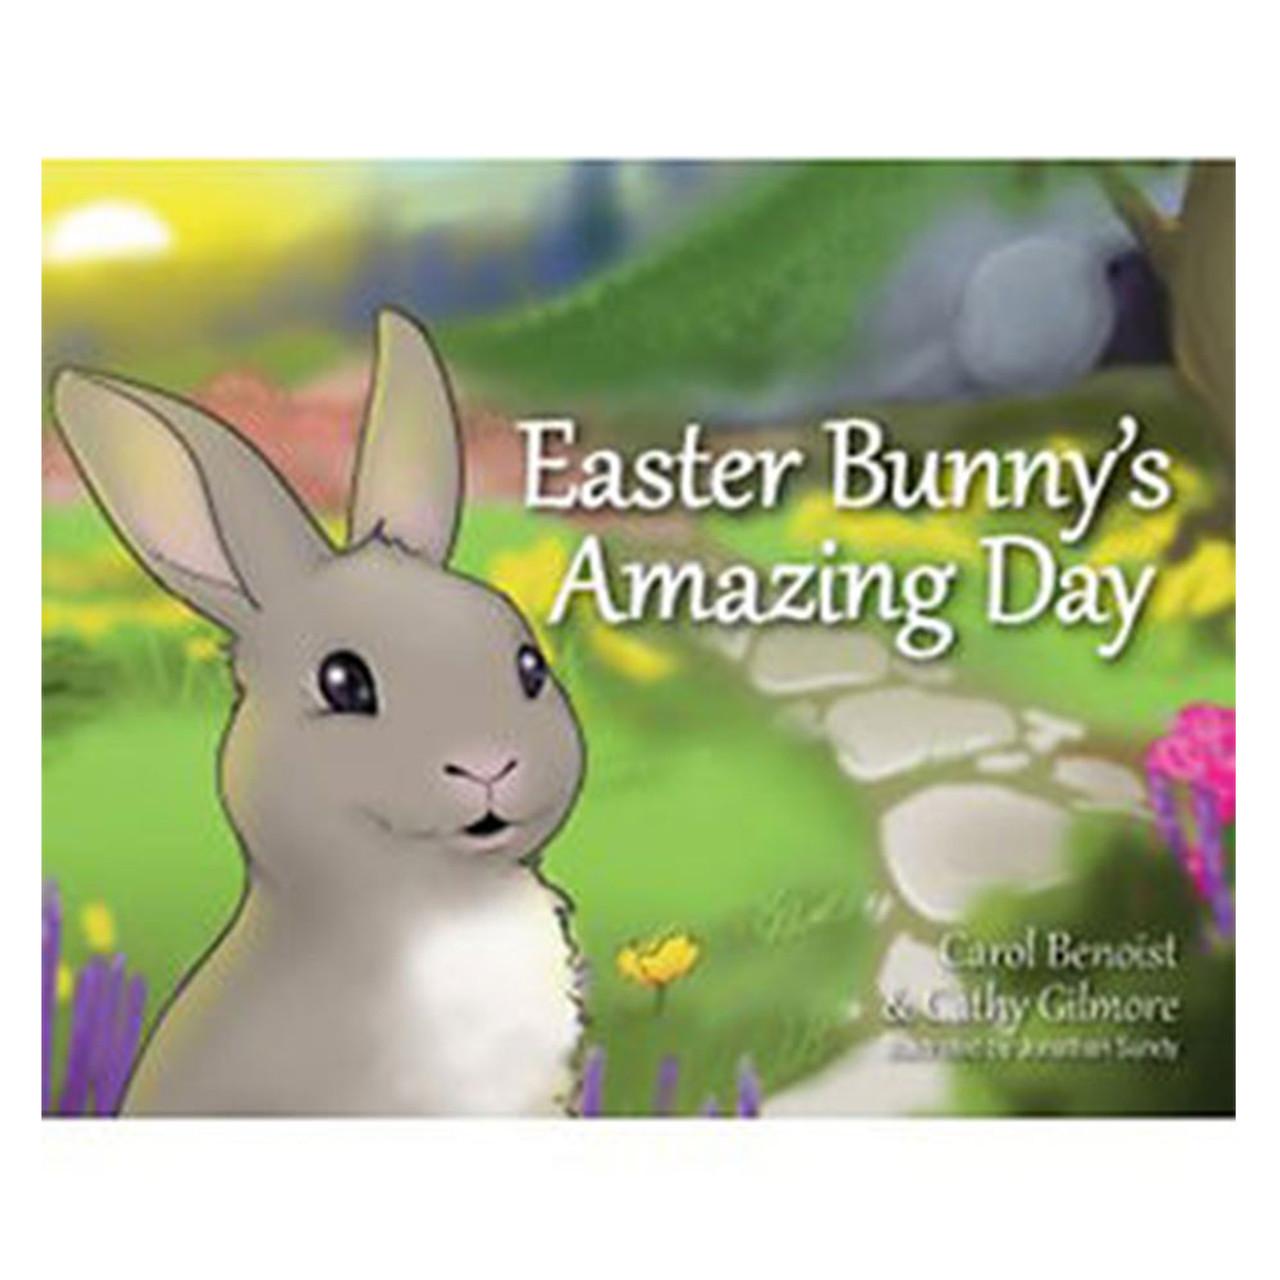 Easter Bunnys Amazing Day Benoist & Gilmore